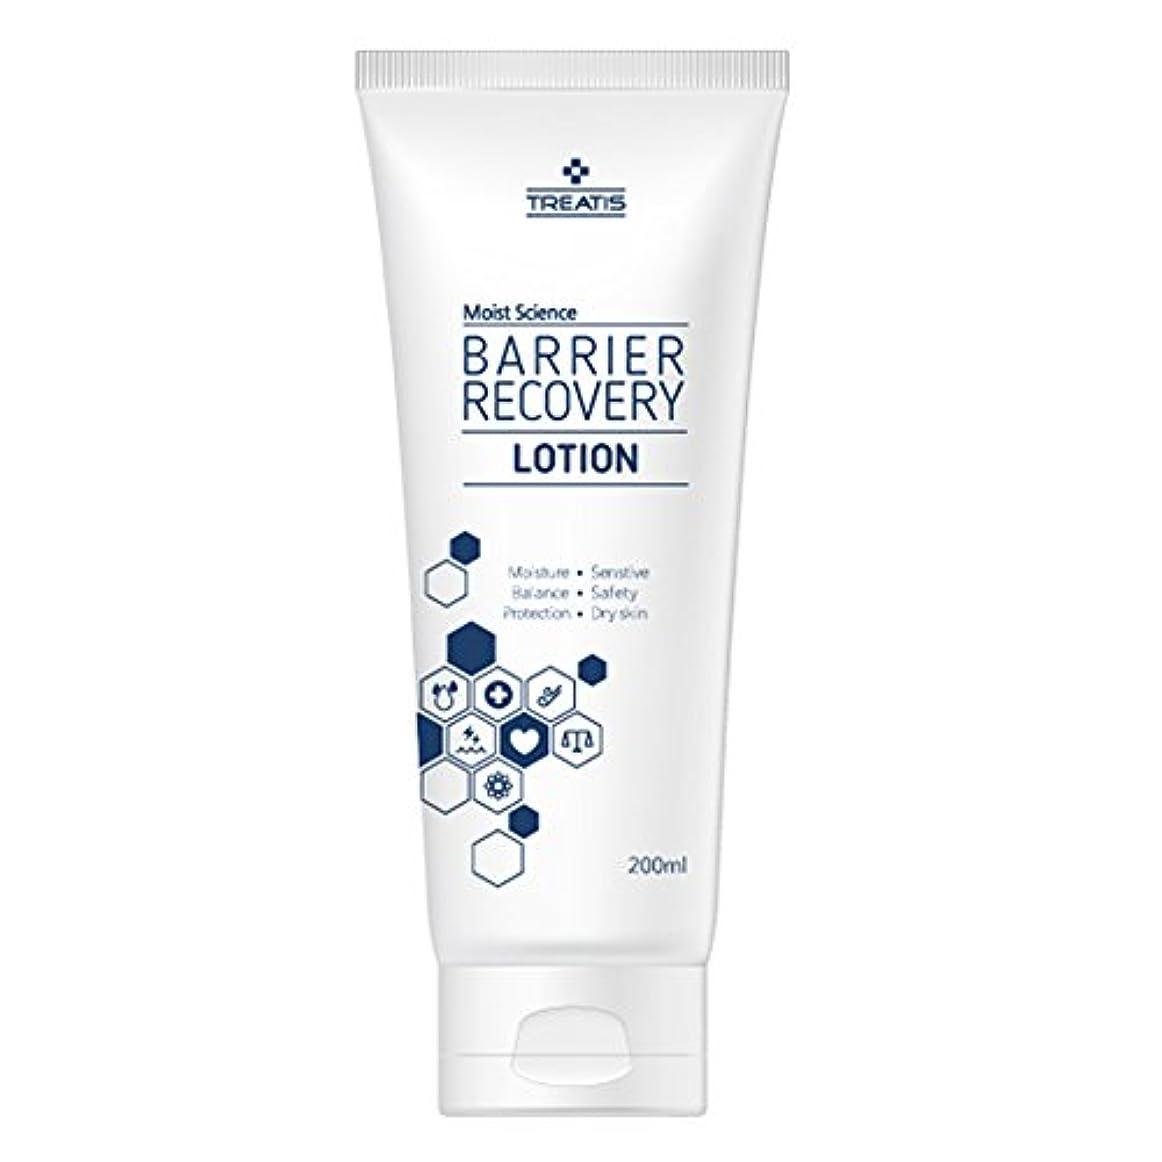 移行政治的構成員Treatis barrier recovery lotion 7oz (200ml)/Moisture, Senstive, Balance, Safty, Protection, Dry skin [並行輸入品]